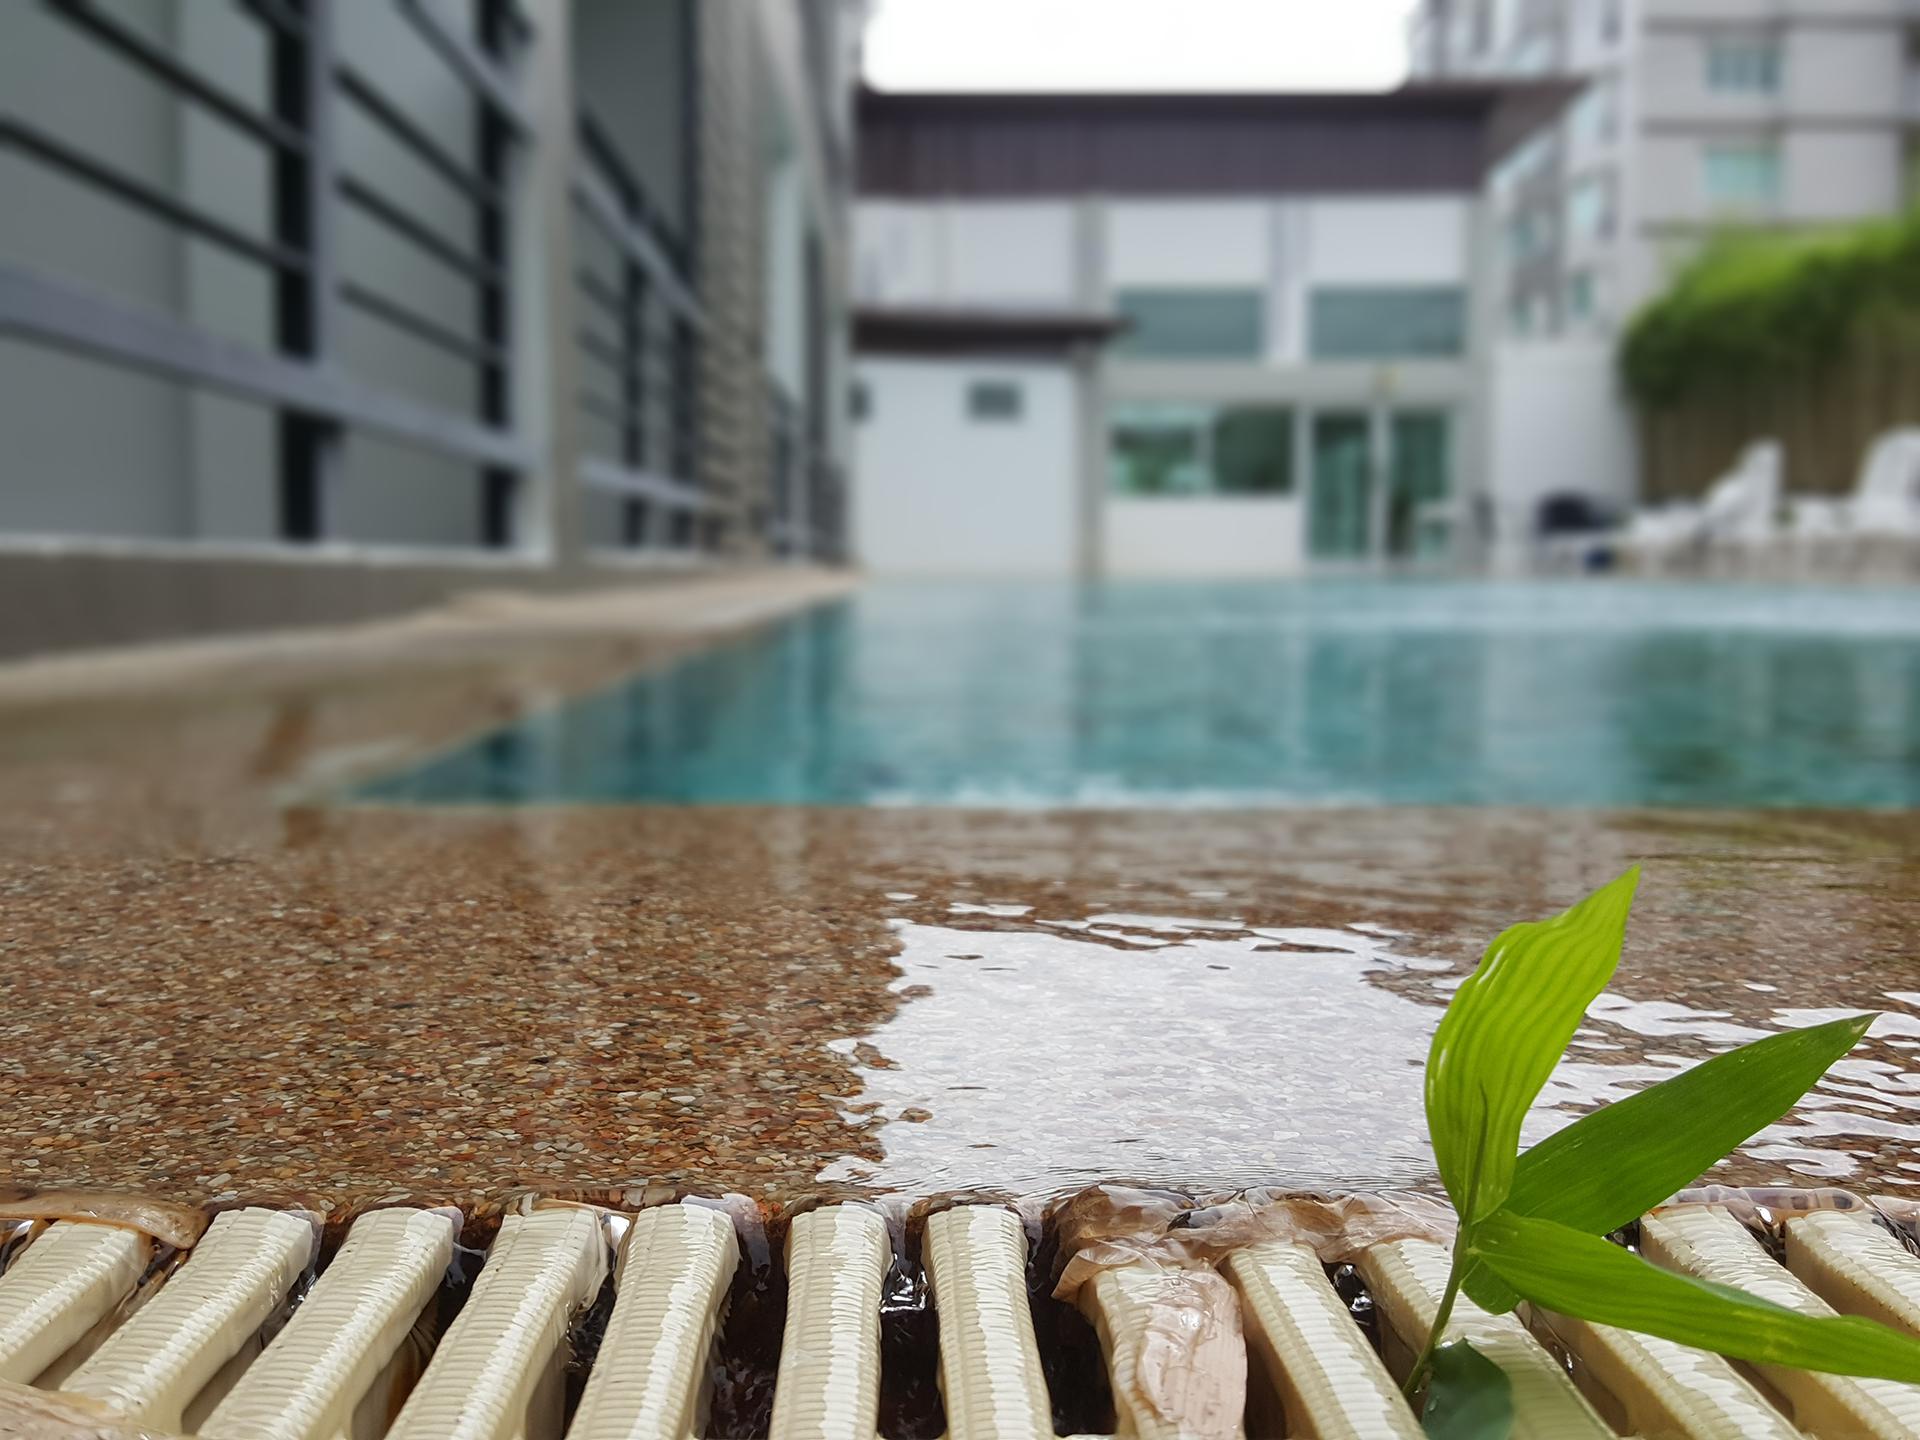 http://retreat-resort.com/images/retreat-resort/our-resort/RelaxAtSwimmingPool.jpg